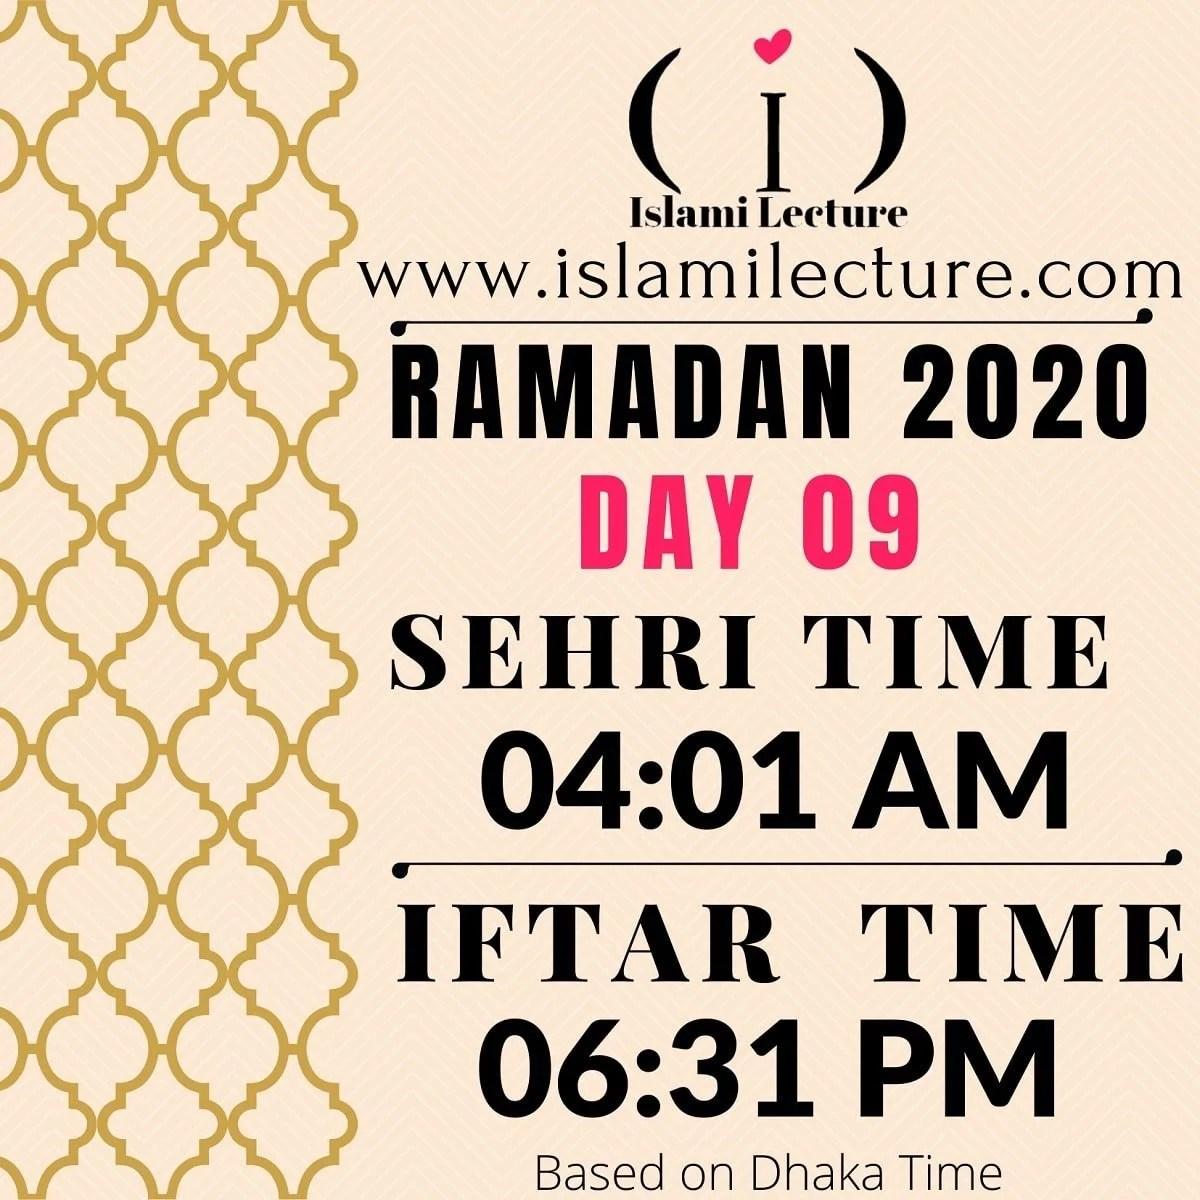 Dhaka Ramadan Time 2020 Sehri & Iftar Time (Day 09)